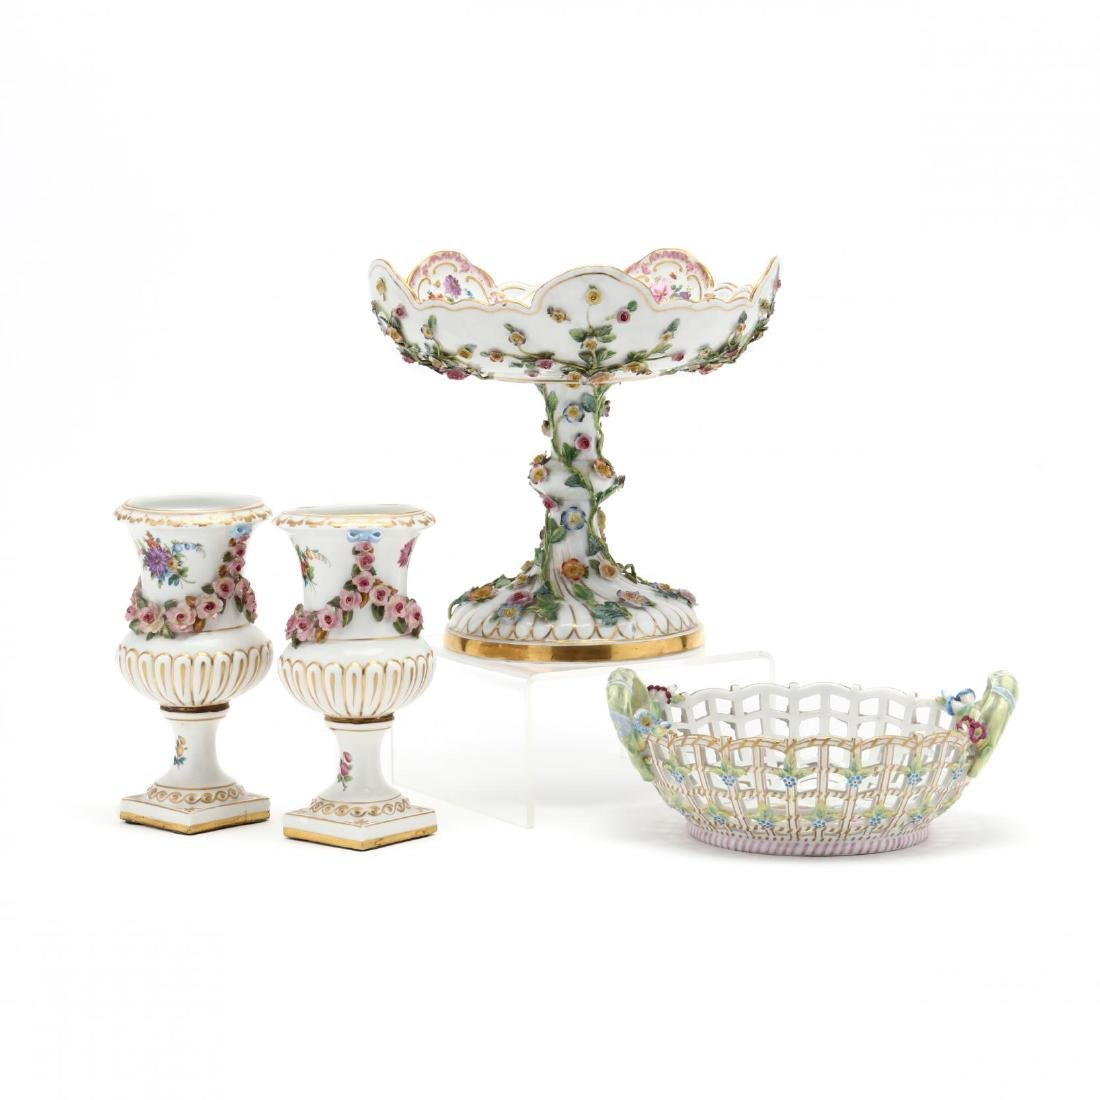 An Antique Porcelain Grouping